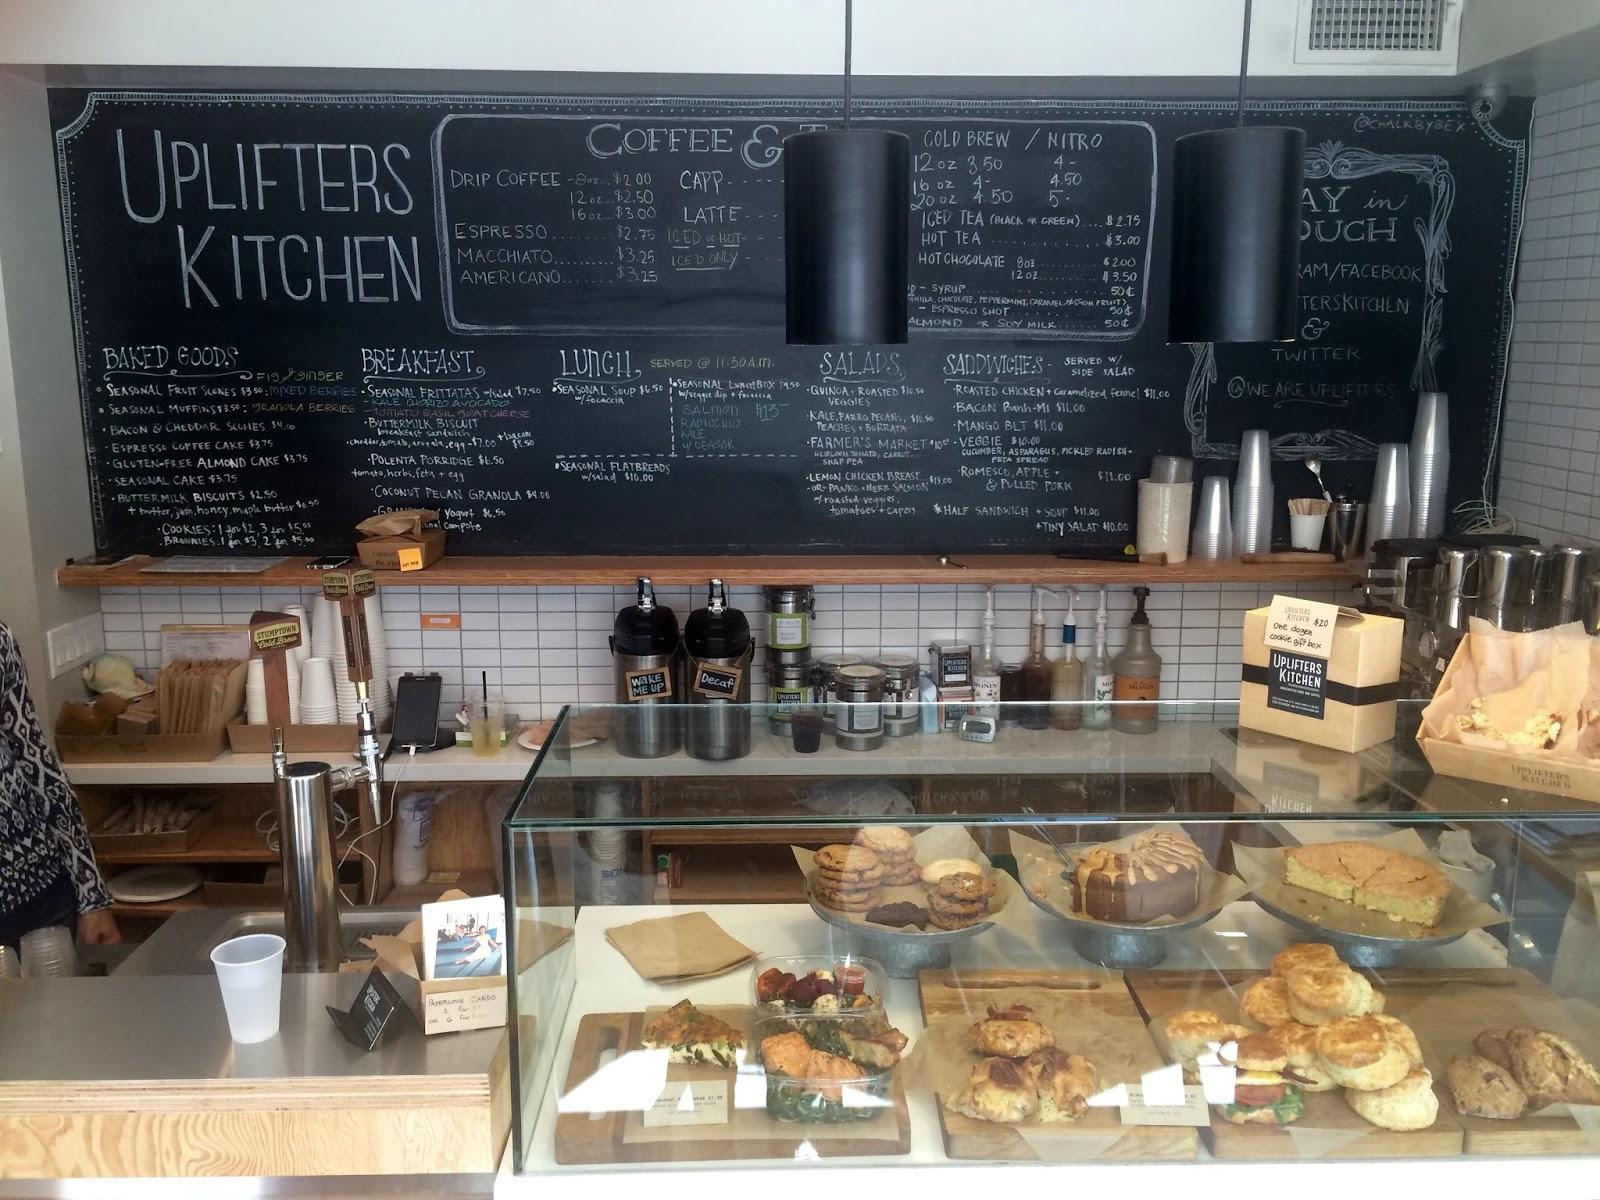 ana lydia monaco website and blog uplifters kitchen cafe